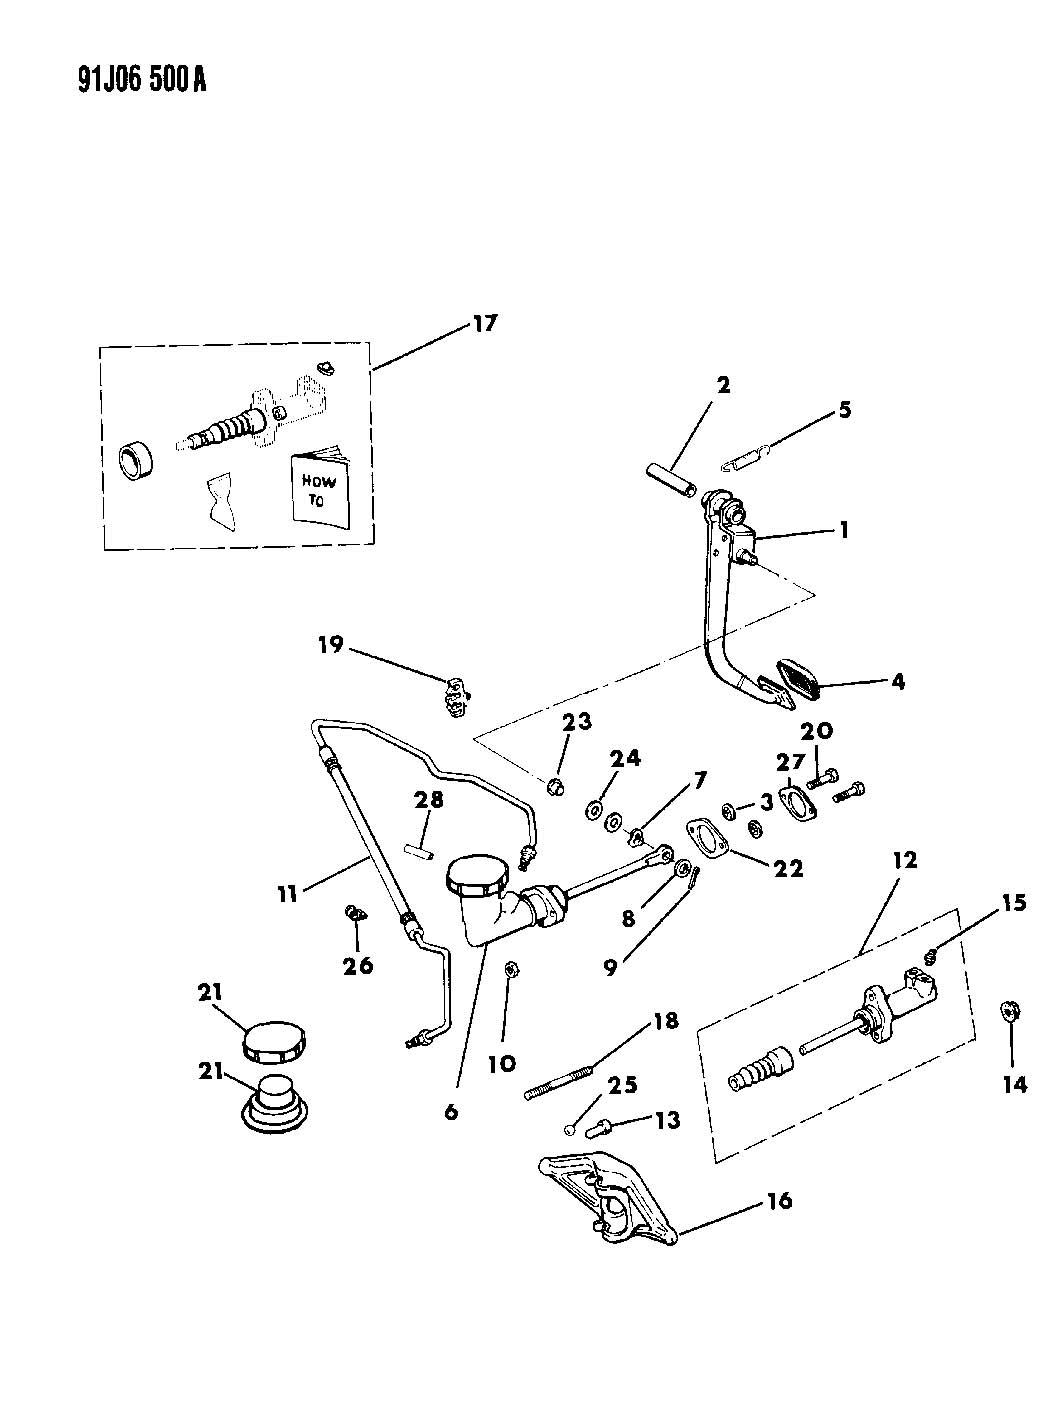 1987 Jeep Anche Fuse Box Diagram 1987 Jeep Motor Wiring